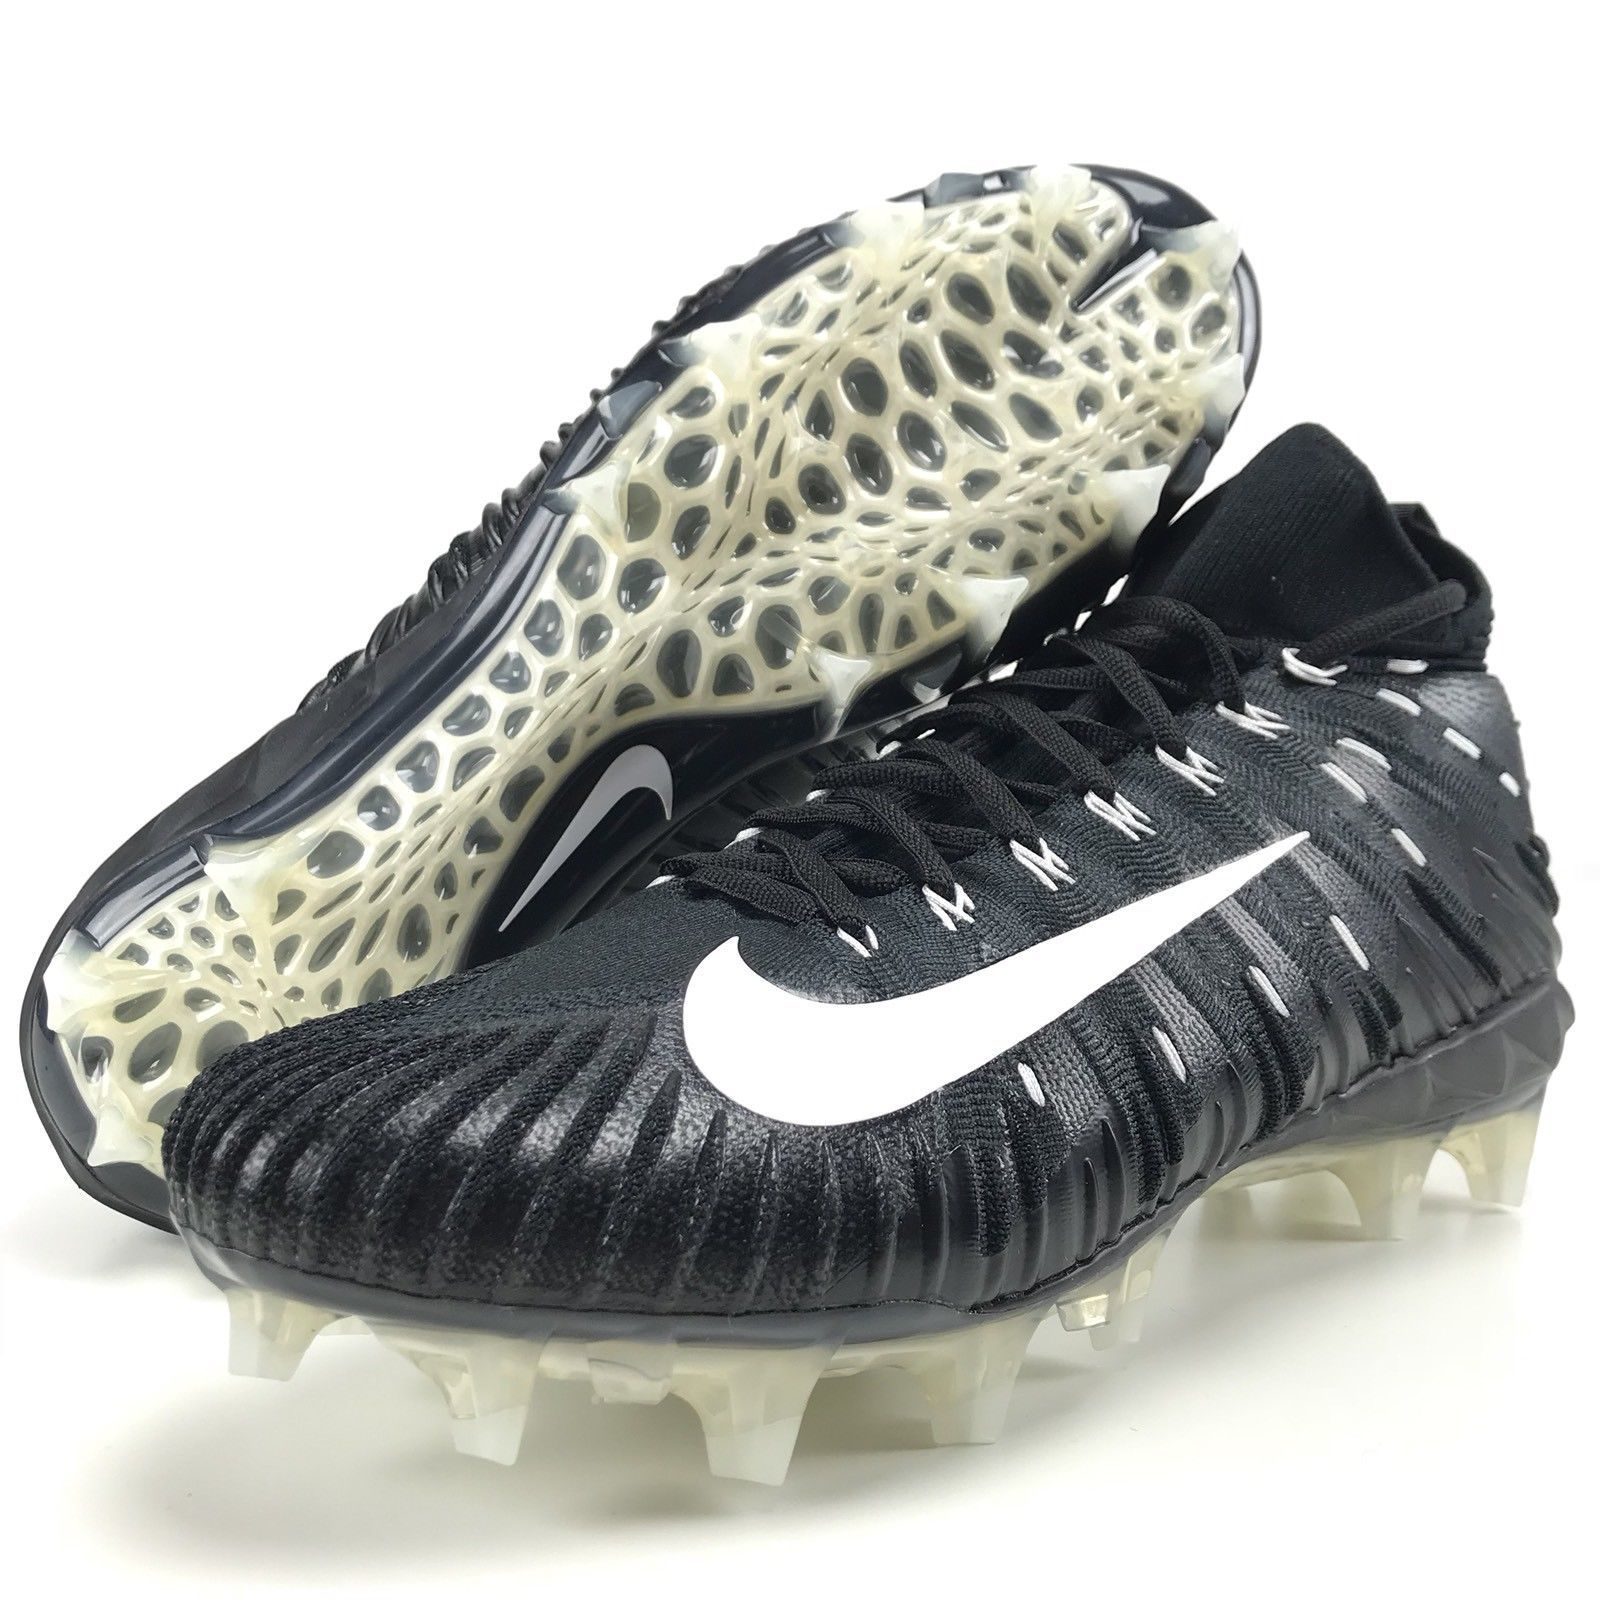 f3d399d47 Nike Alpha Menace Elite Football Cleats 13 and 30 similar items. 57